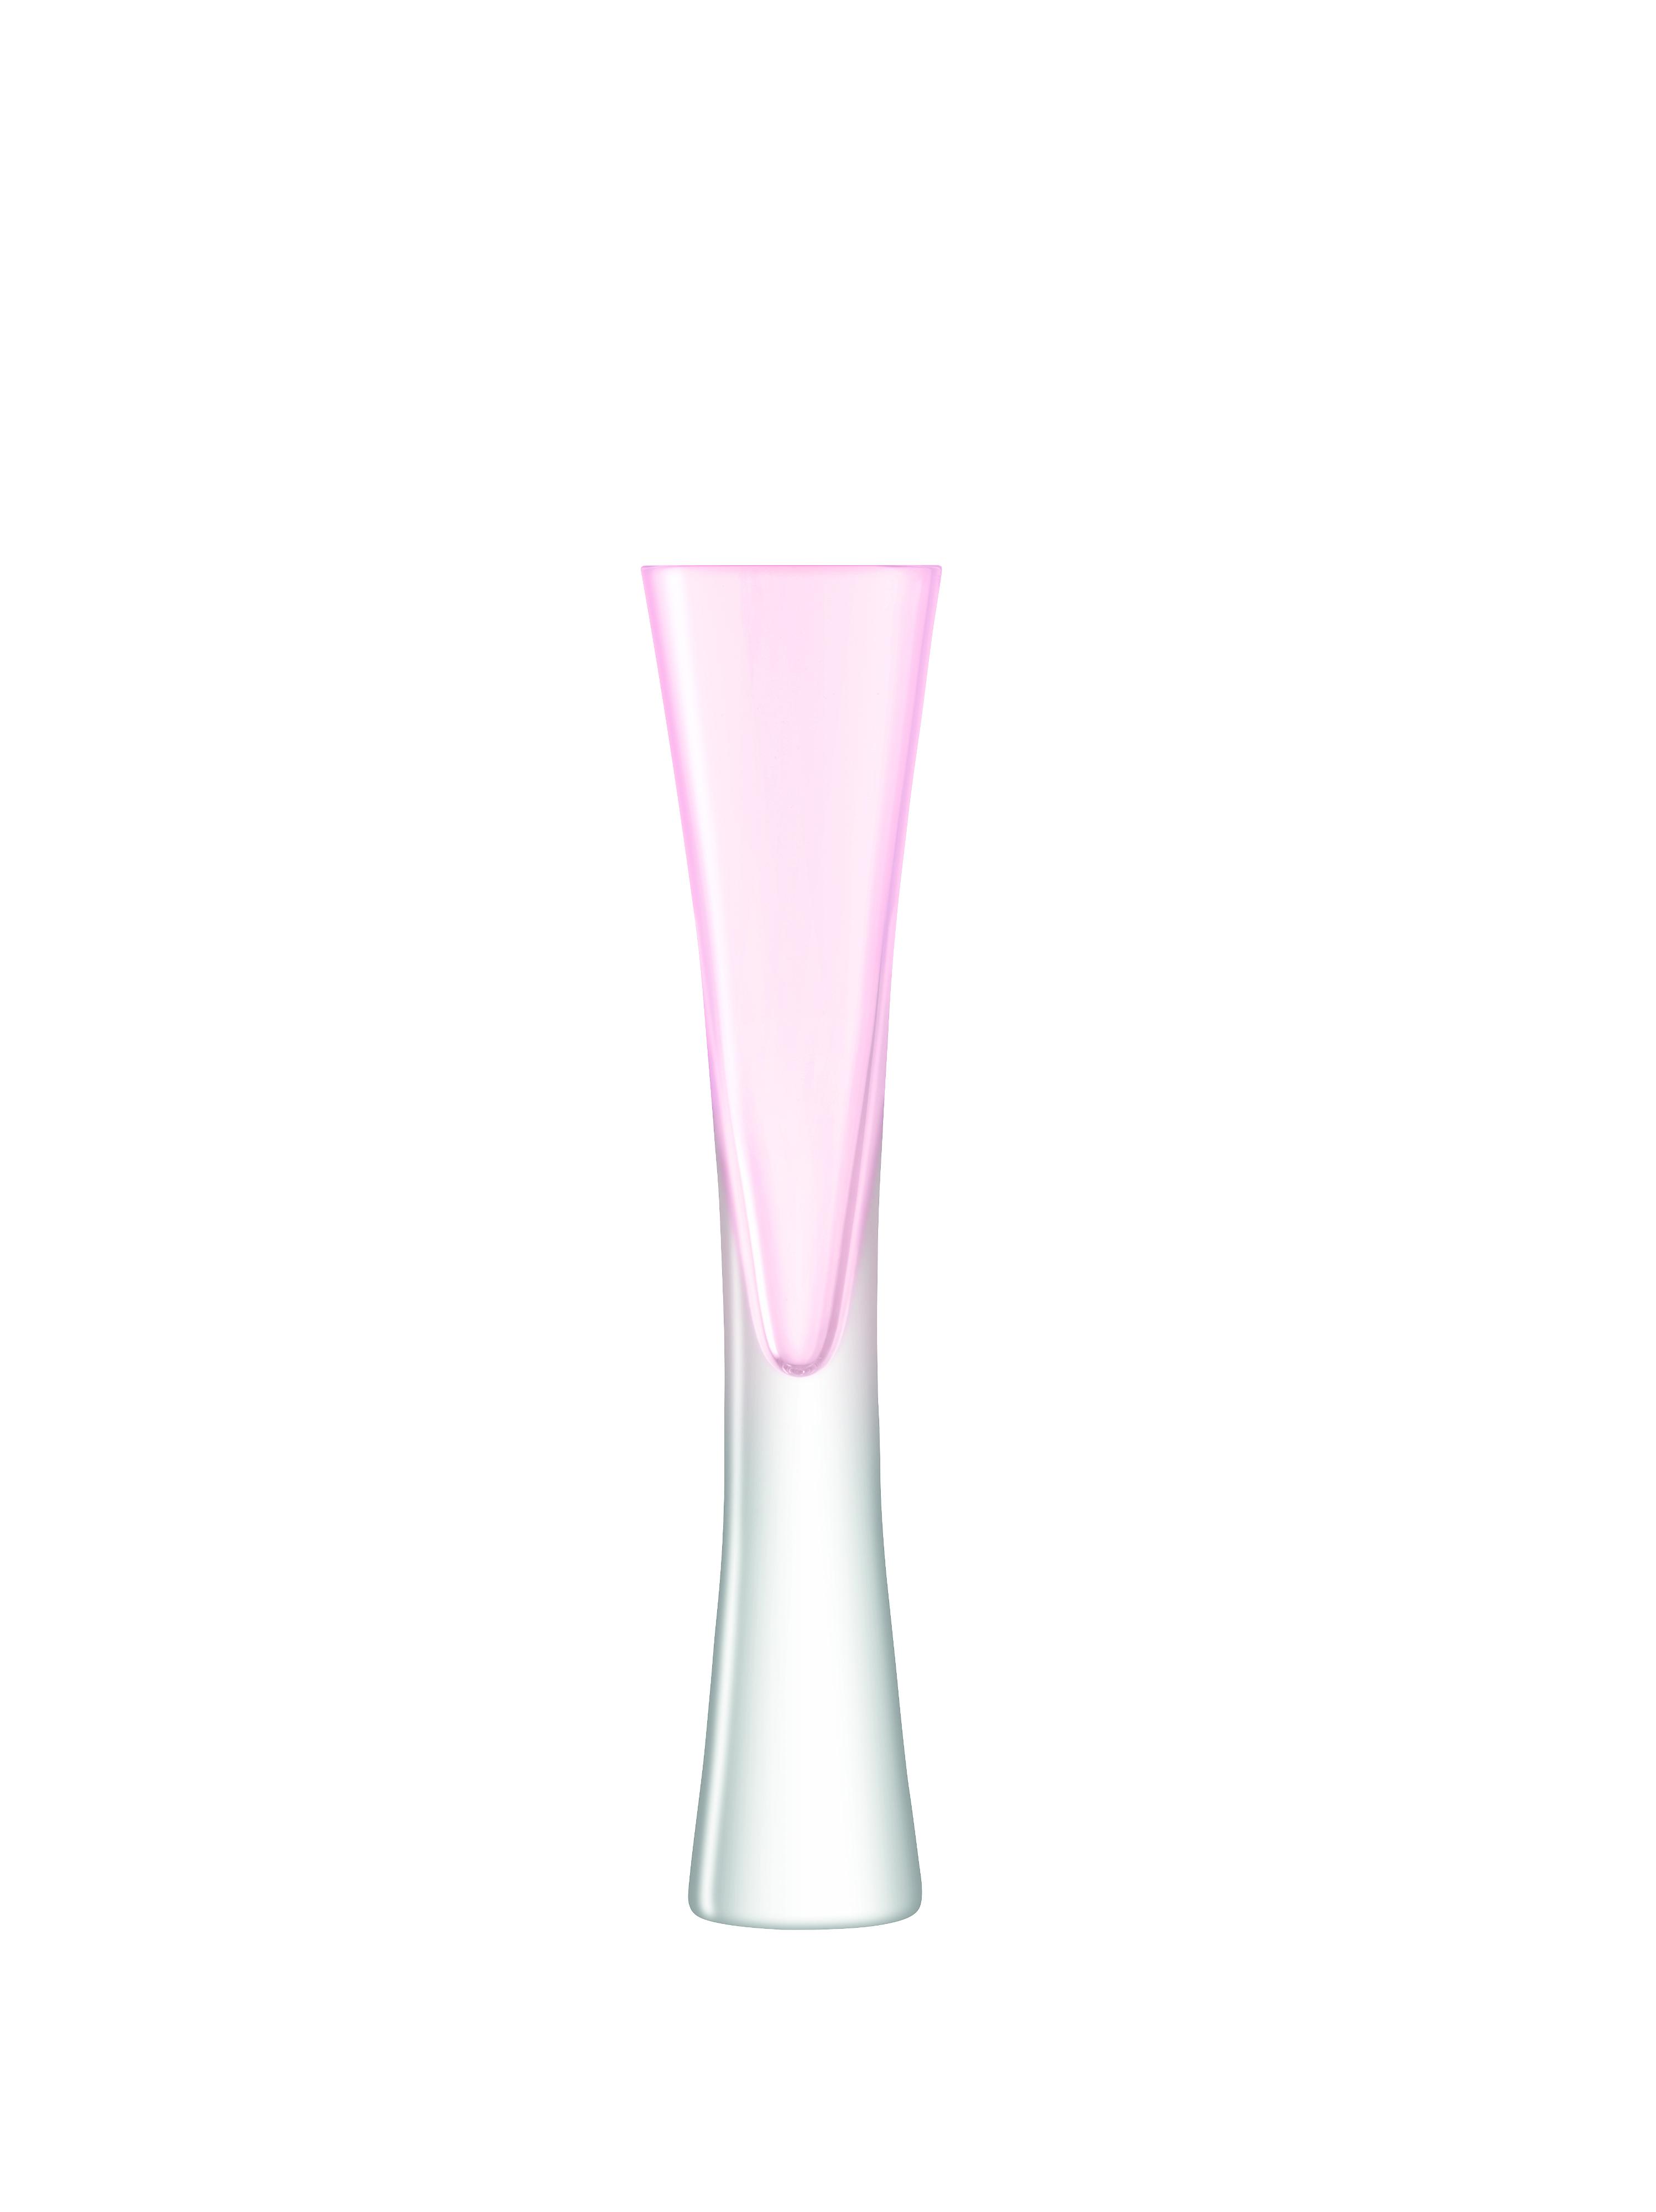 LSA International Moya Blush Flute Champagne Glasses (Pair)